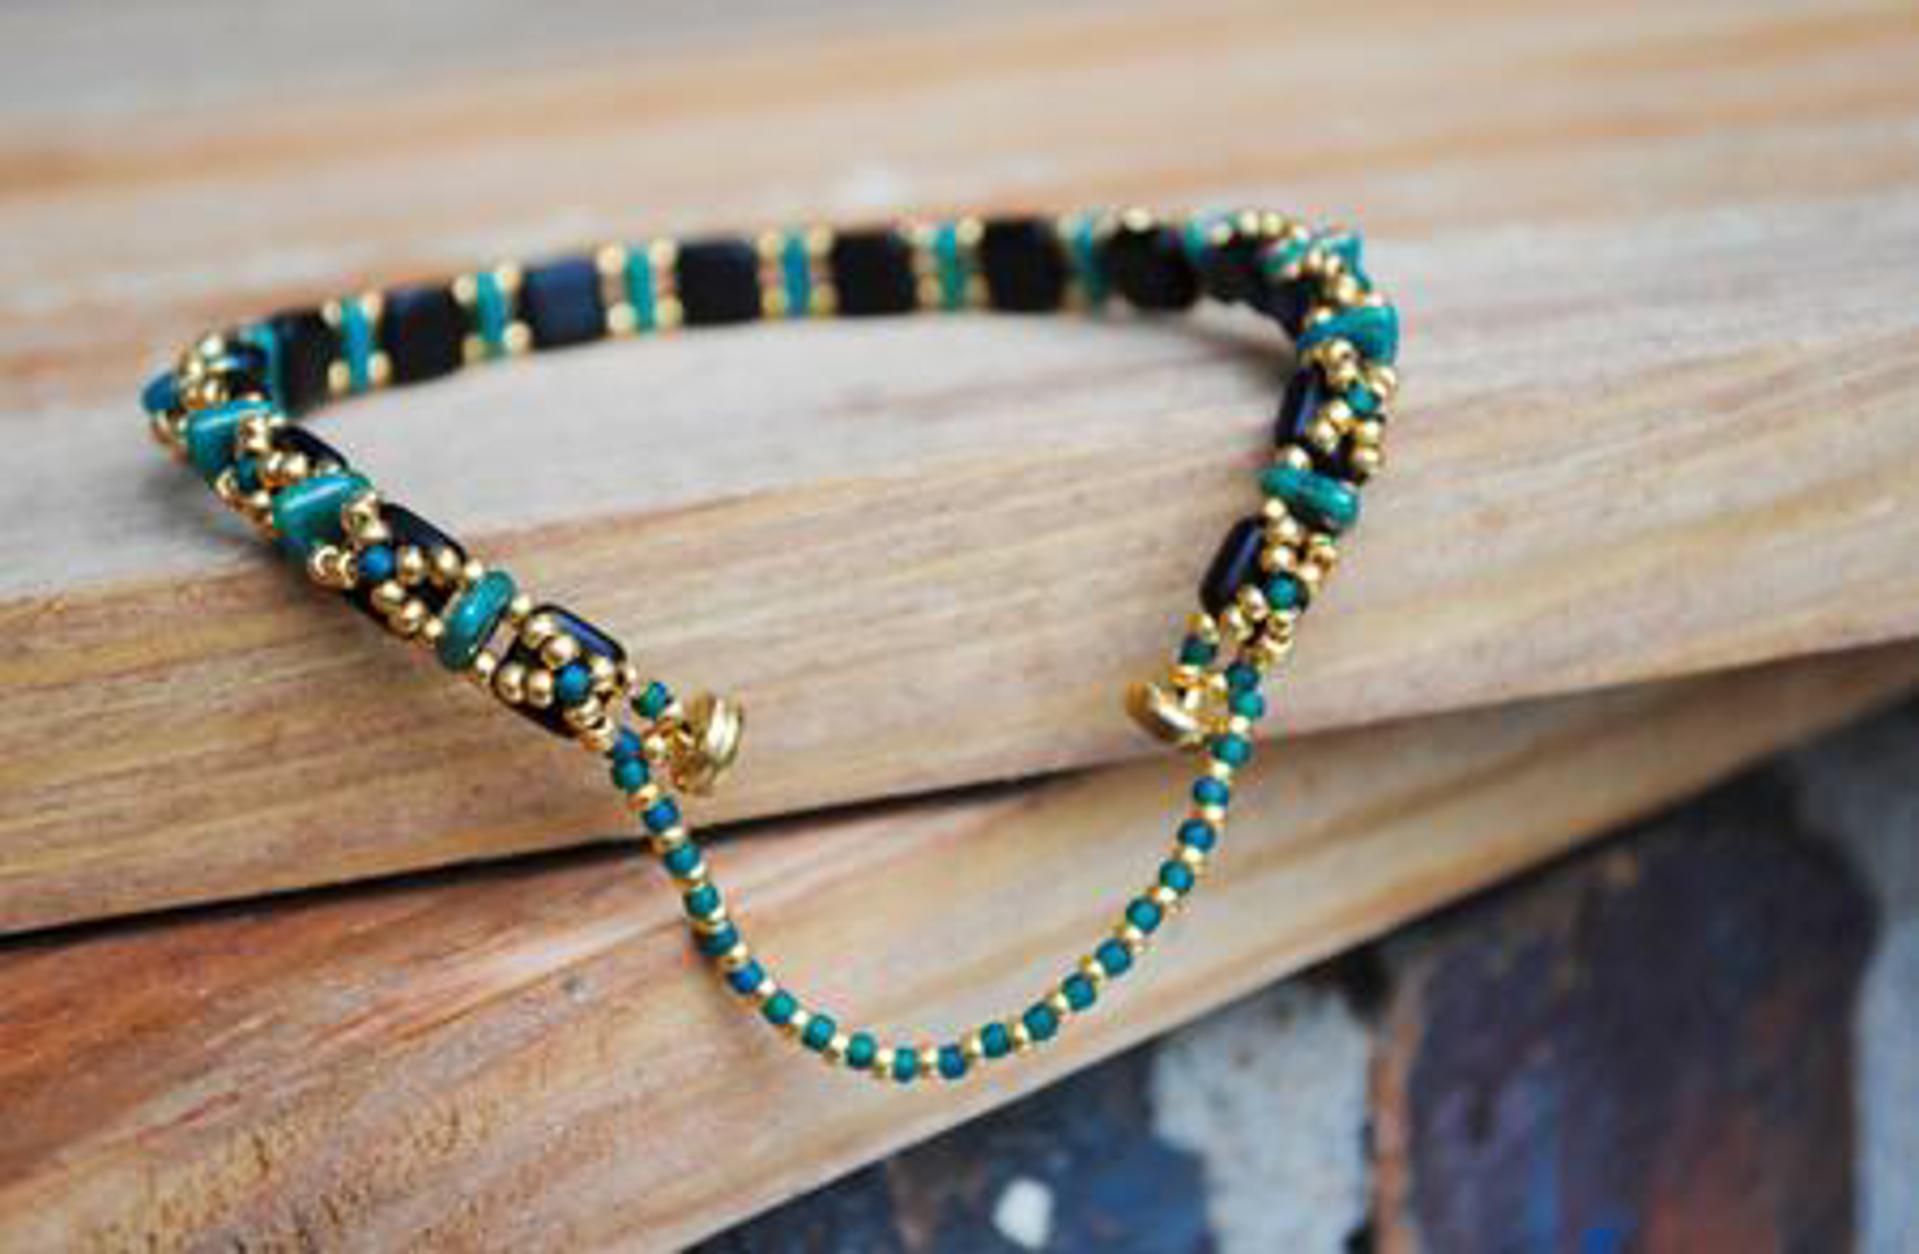 Beaded Tile Bracelets by Sam Taylor